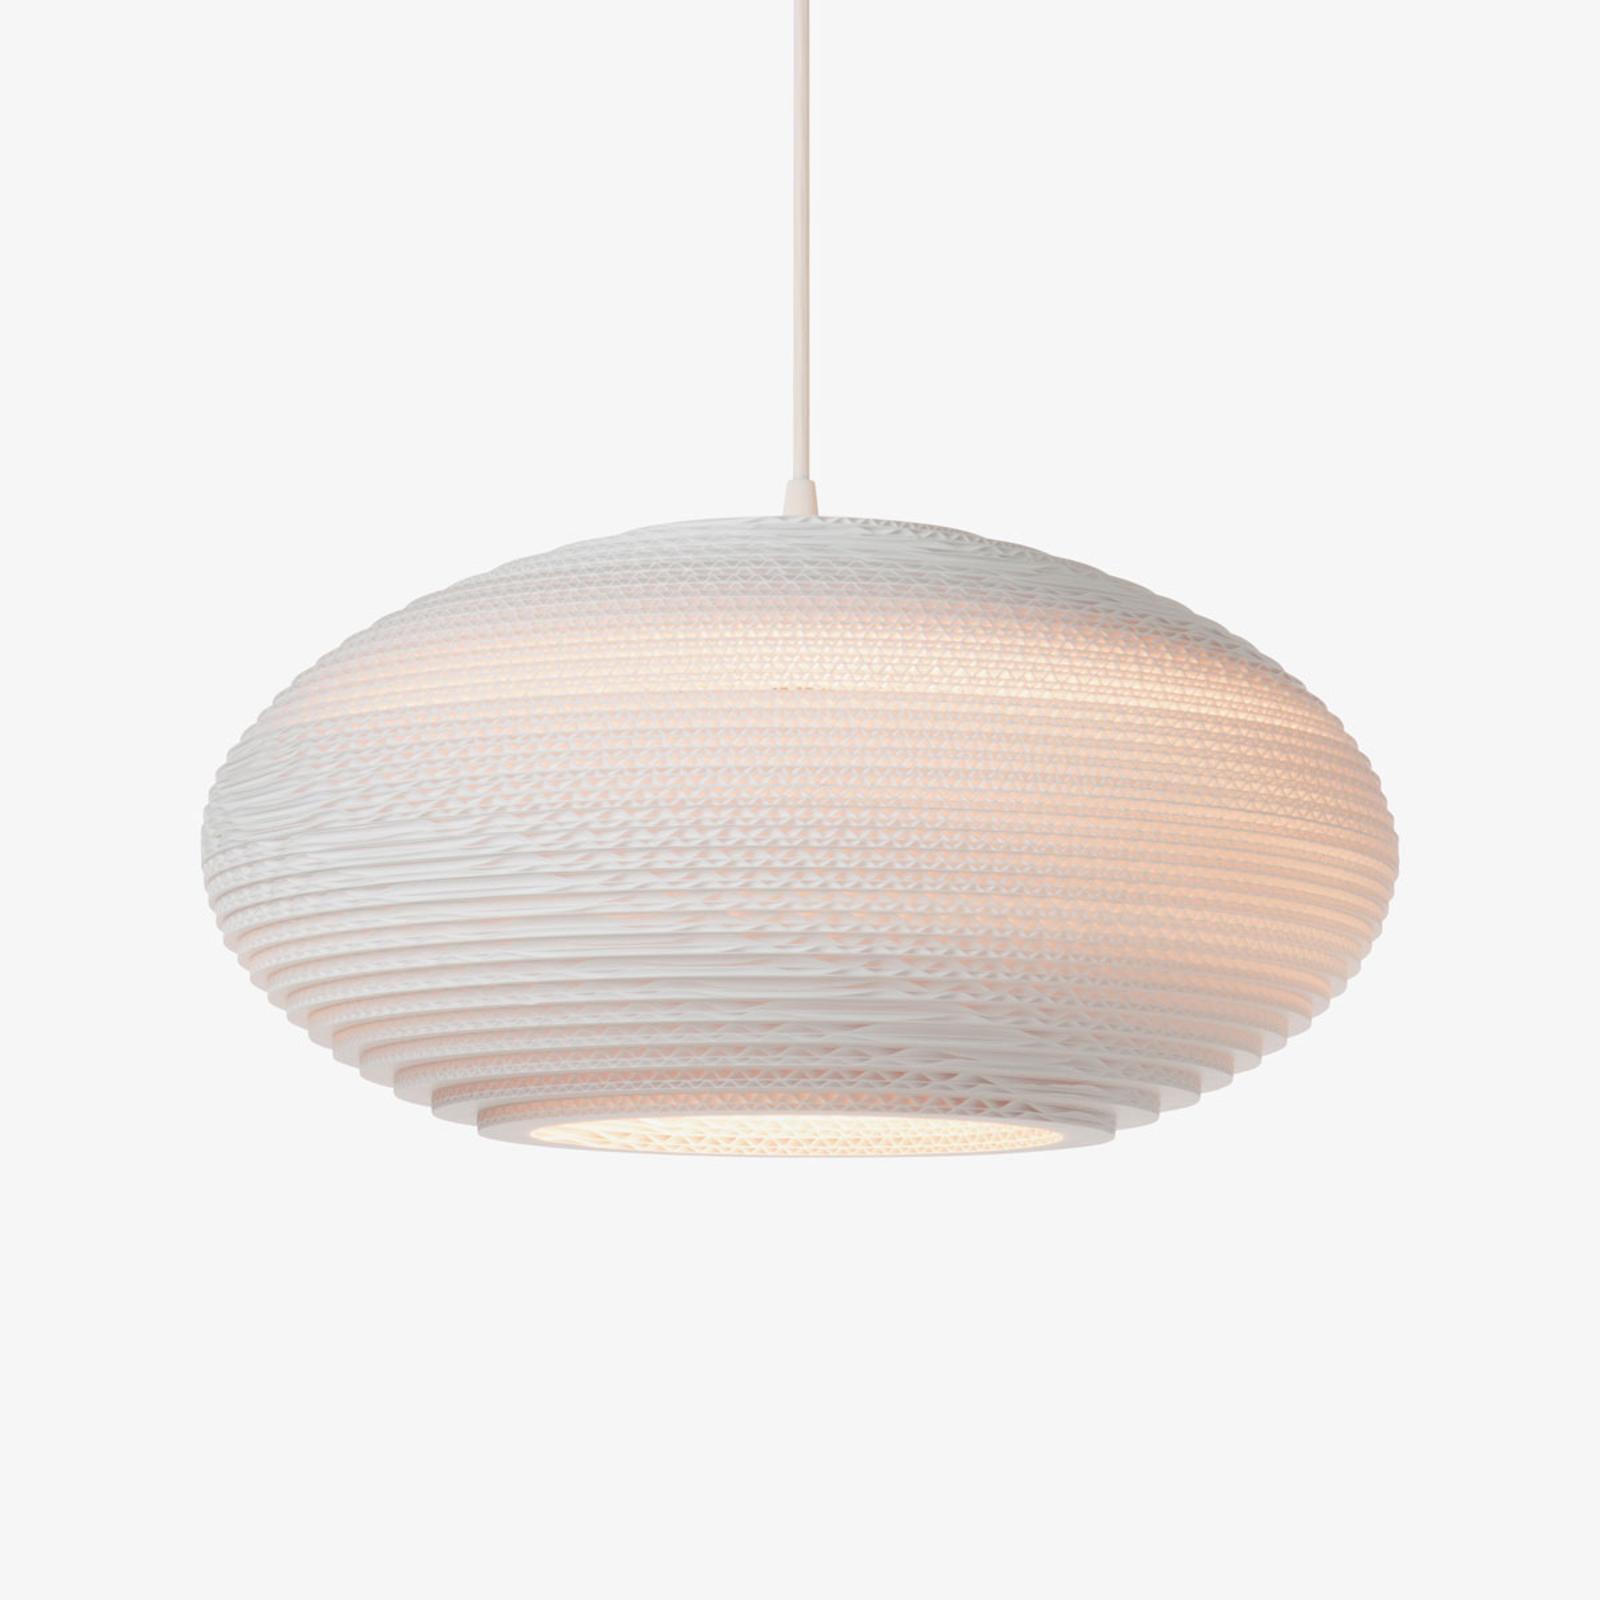 Hanglamp Disc wit Ø 50 cm